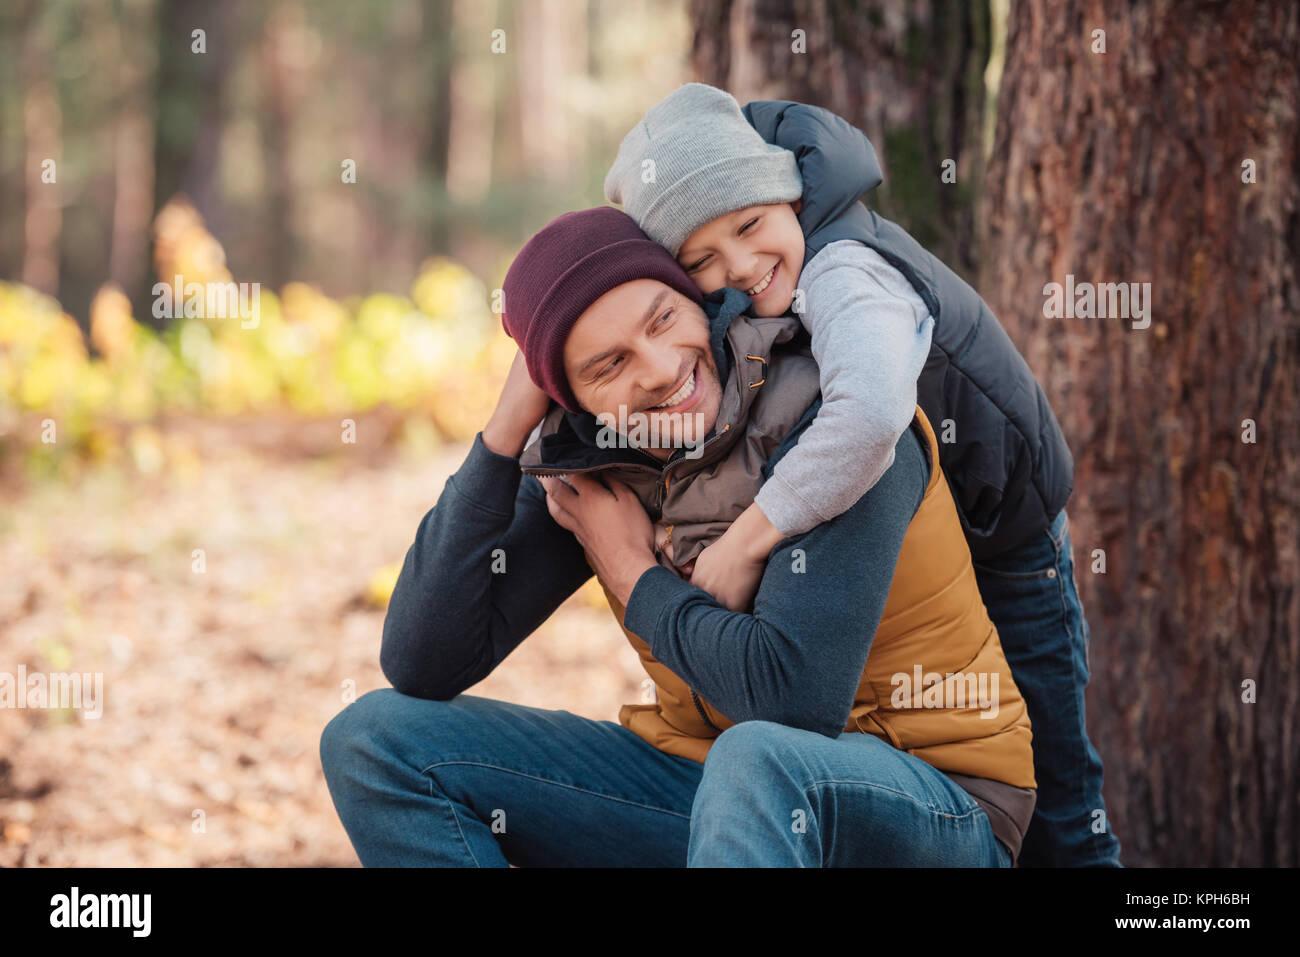 Vater und Sohn umarmen im Wald Stockbild